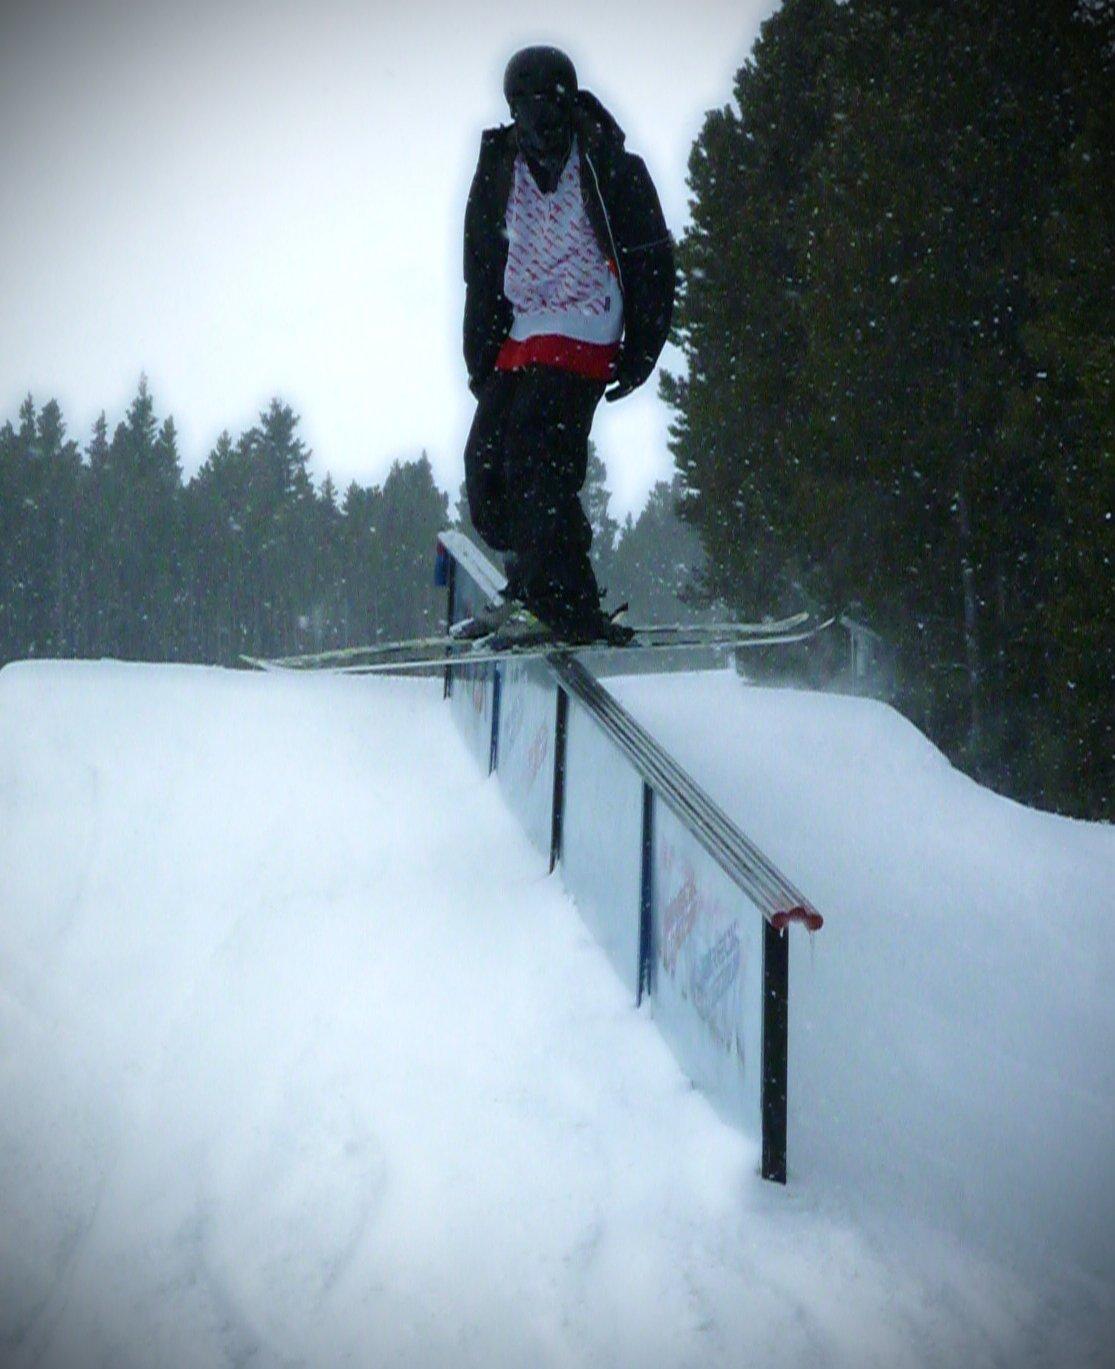 Down rail at Breck